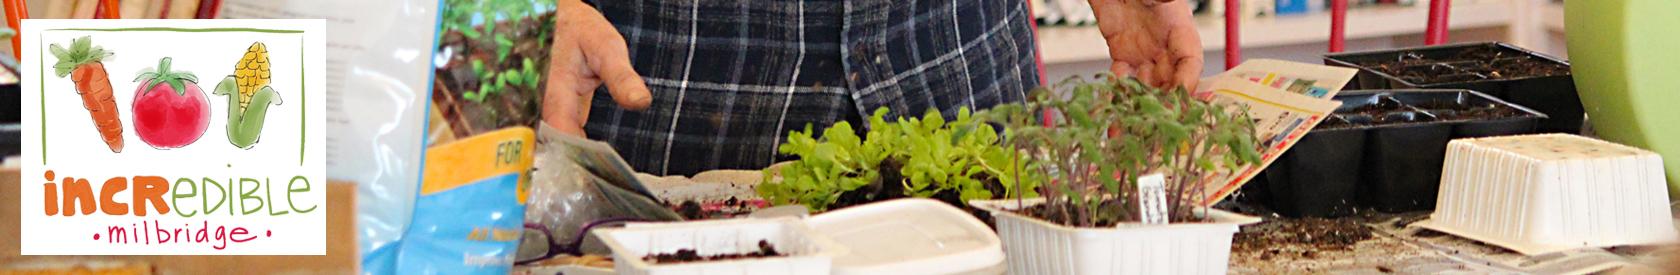 IEM Garden Workshops and Tours